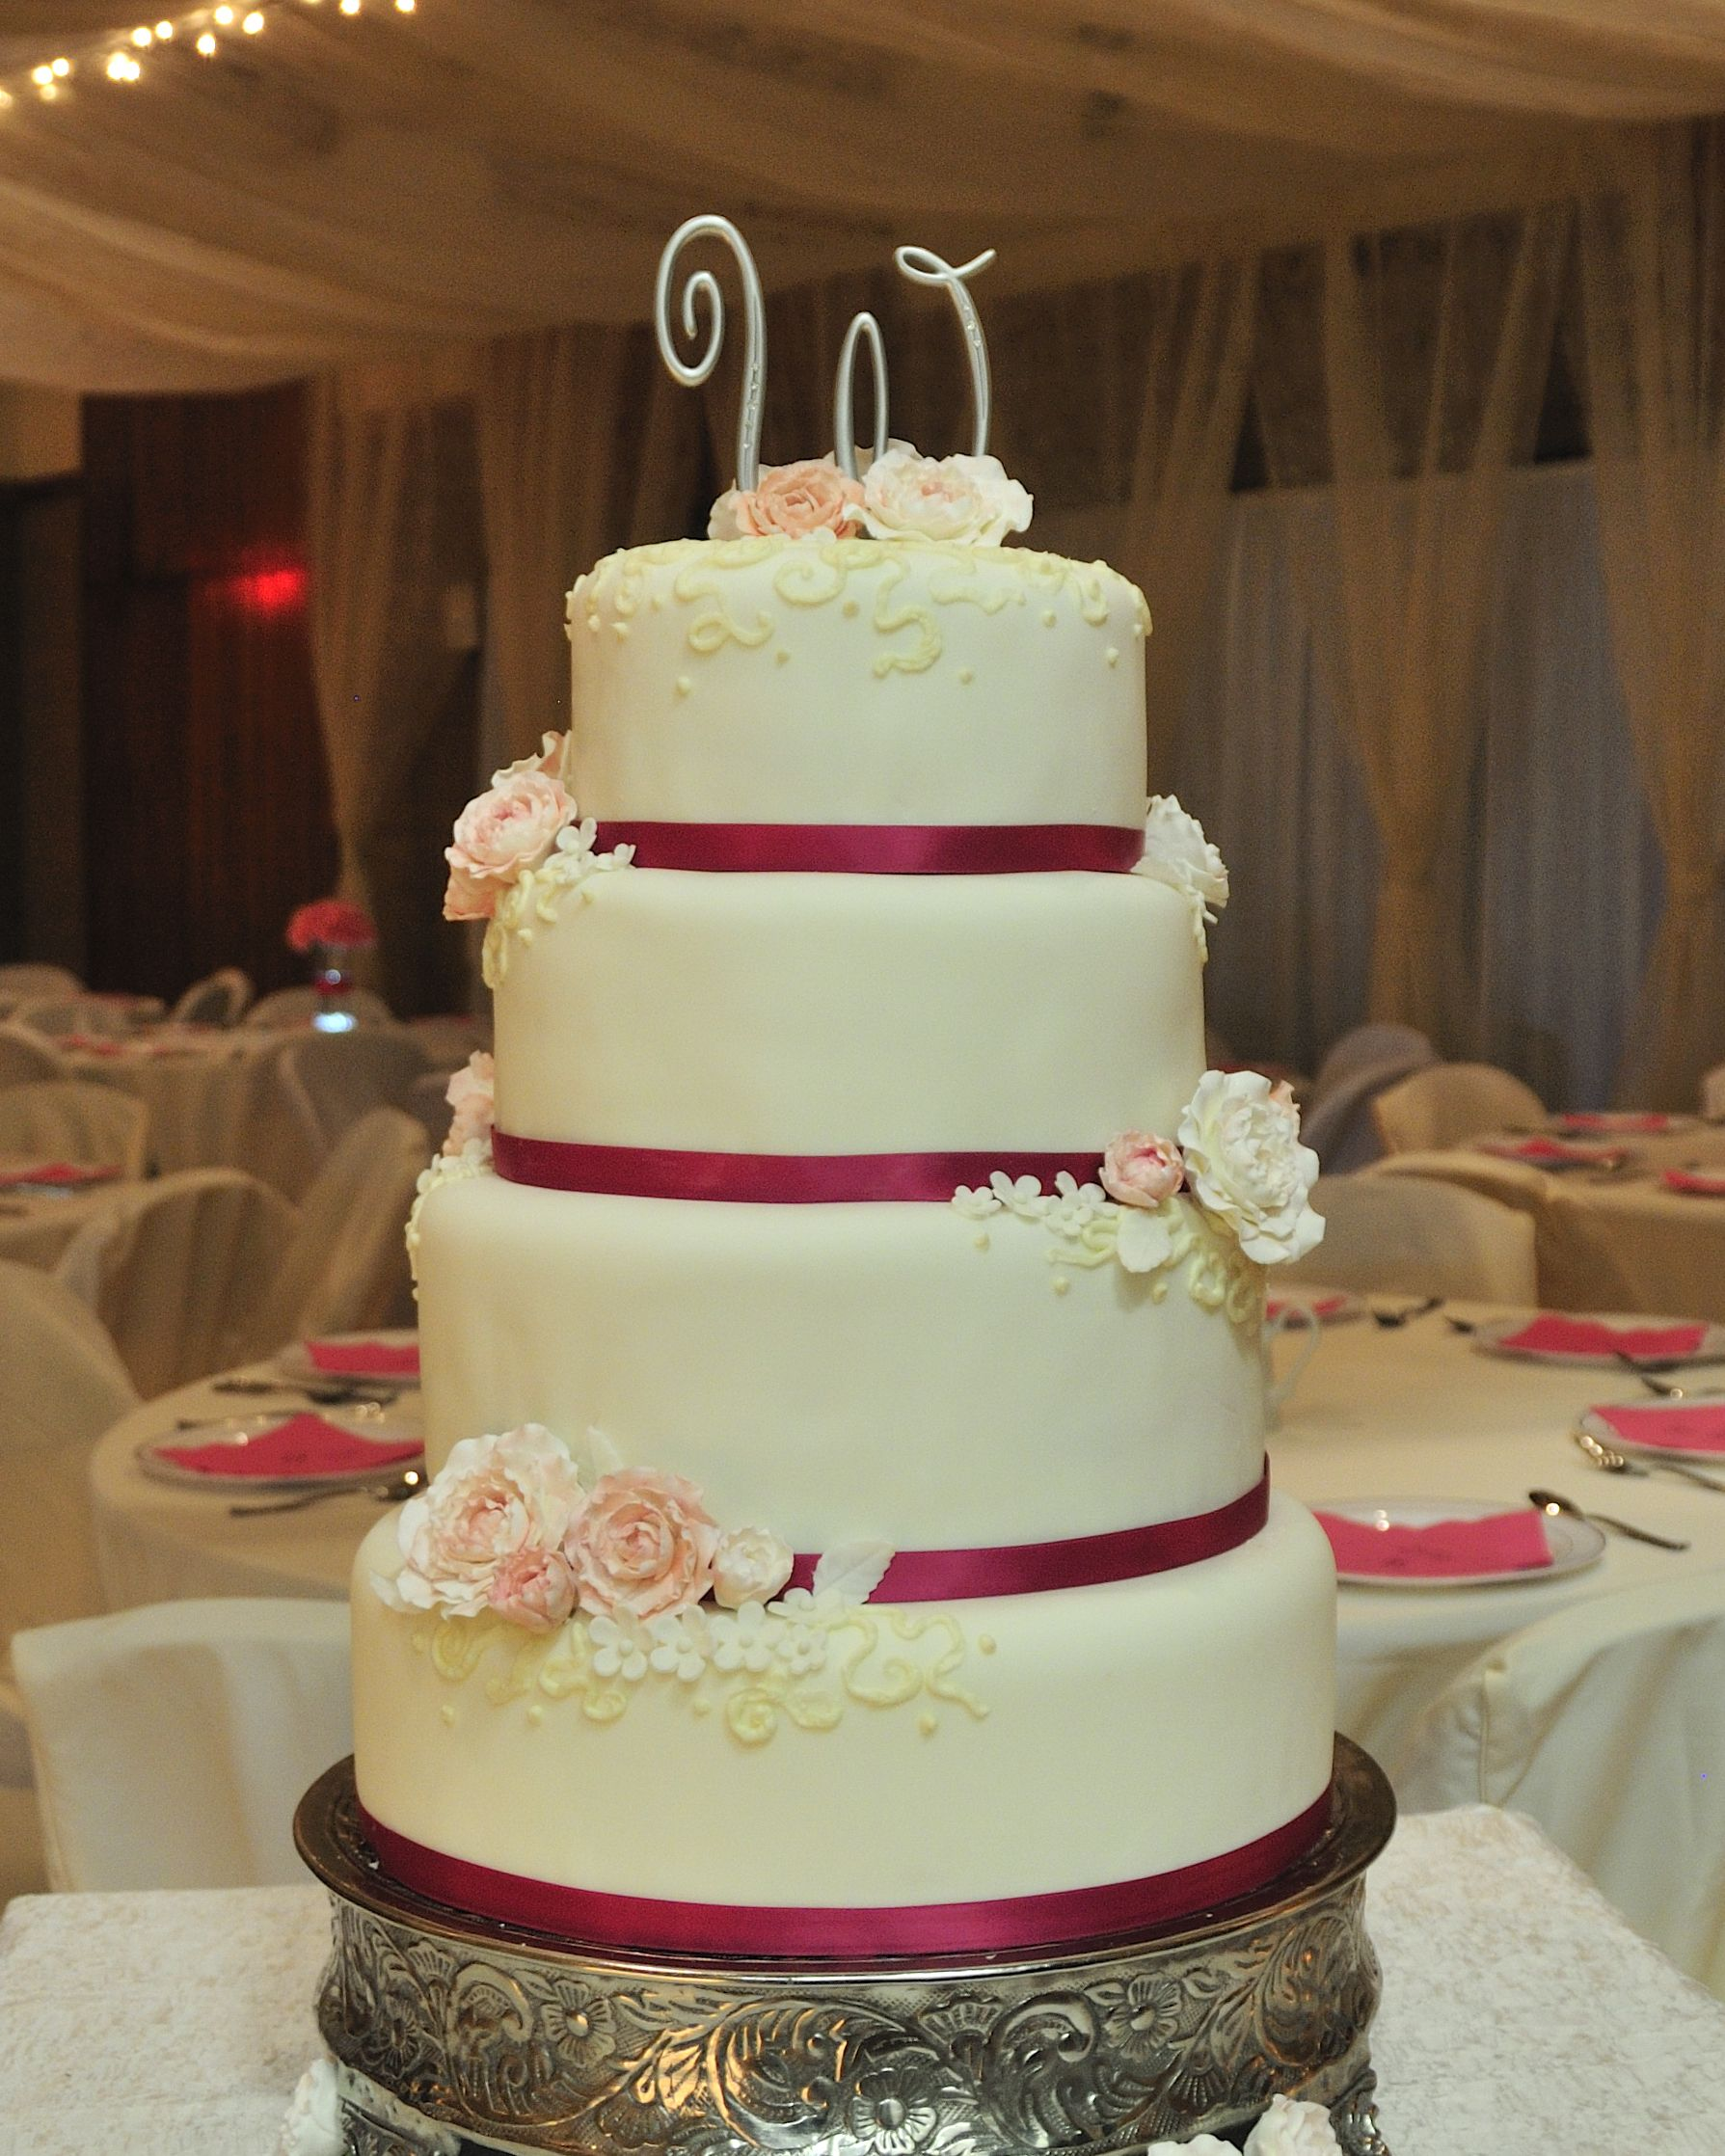 Fondant Flowers For Wedding Cakes: Fondant Wedding Cake With Gumpaste Peonies